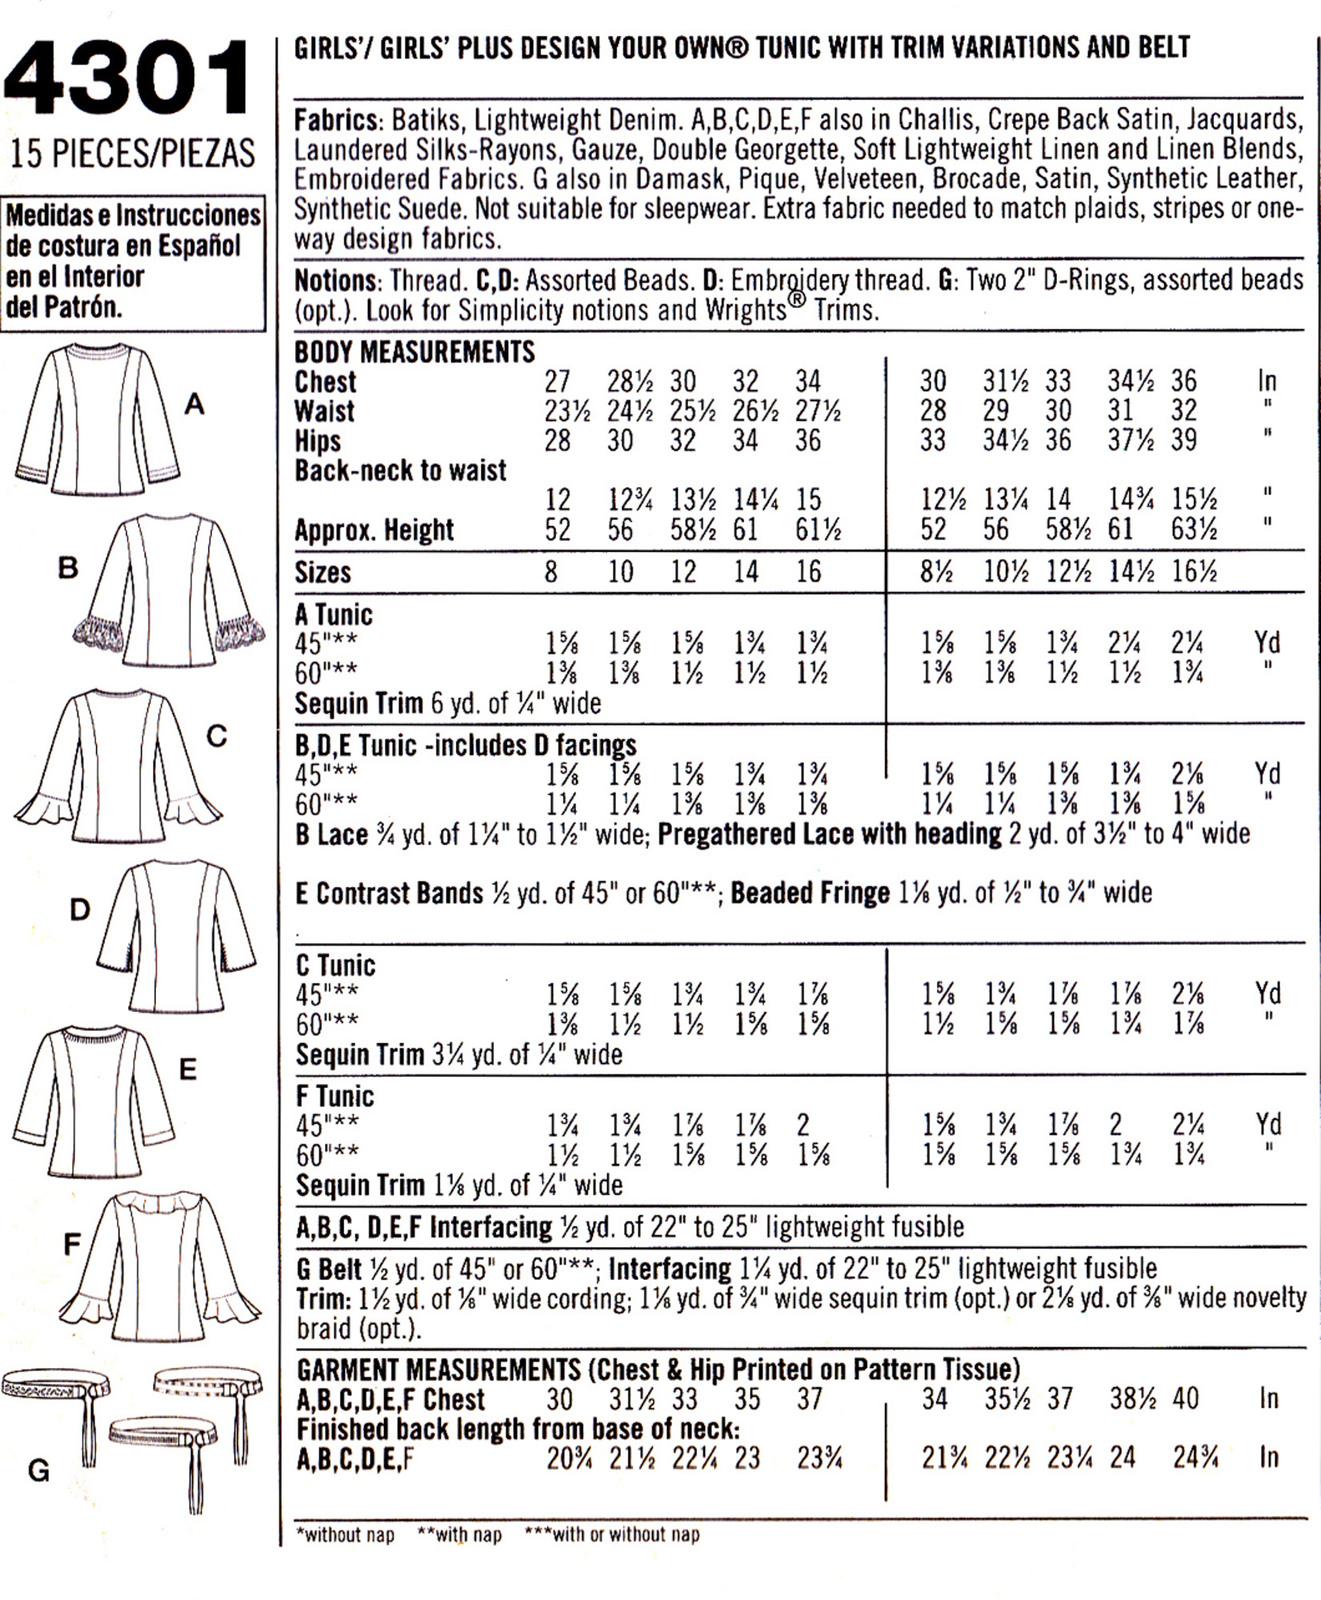 Simplicity 4301 Girls / Girls Plus Sewing Pattern Childrens Shirts Size 8-16 1/2